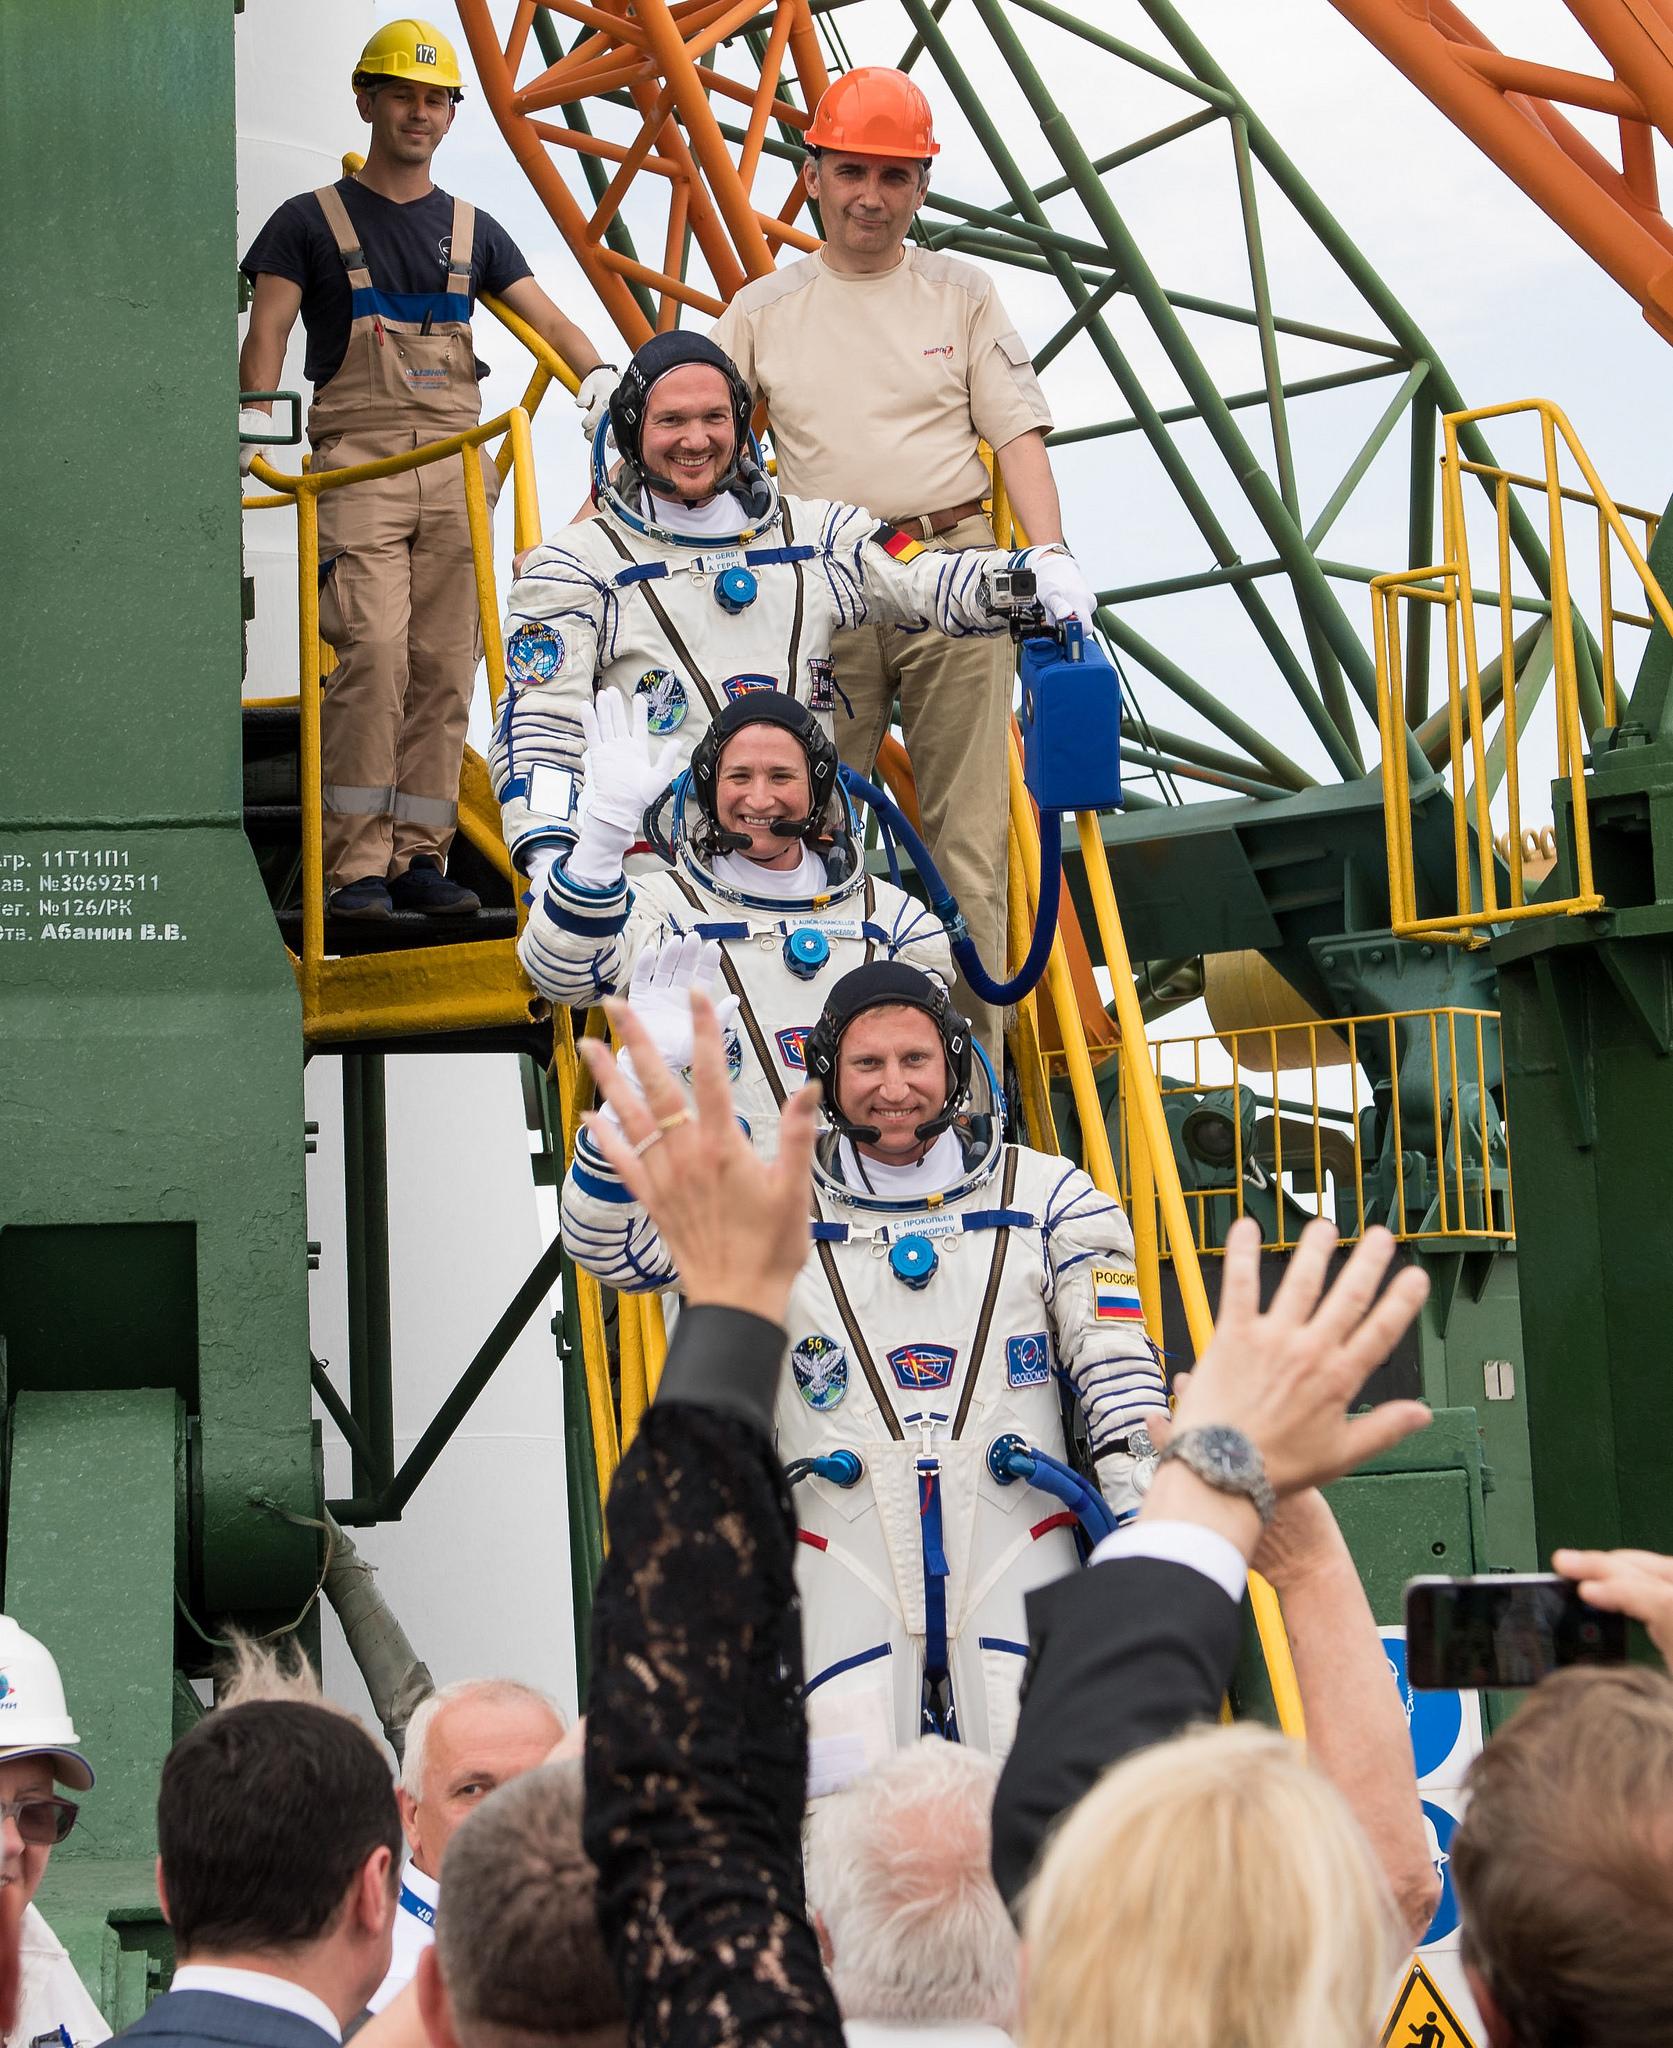 Alexander Gerst of ESA, top,Serena Auñón-Chancellor of NASA, middle, and Soyuz Commander Sergey Prokopyev of Roscosmos wave farewell before boarding the Soyuz MS-09 spacecraft for launch. Credit: Joel Kowsky / NASA